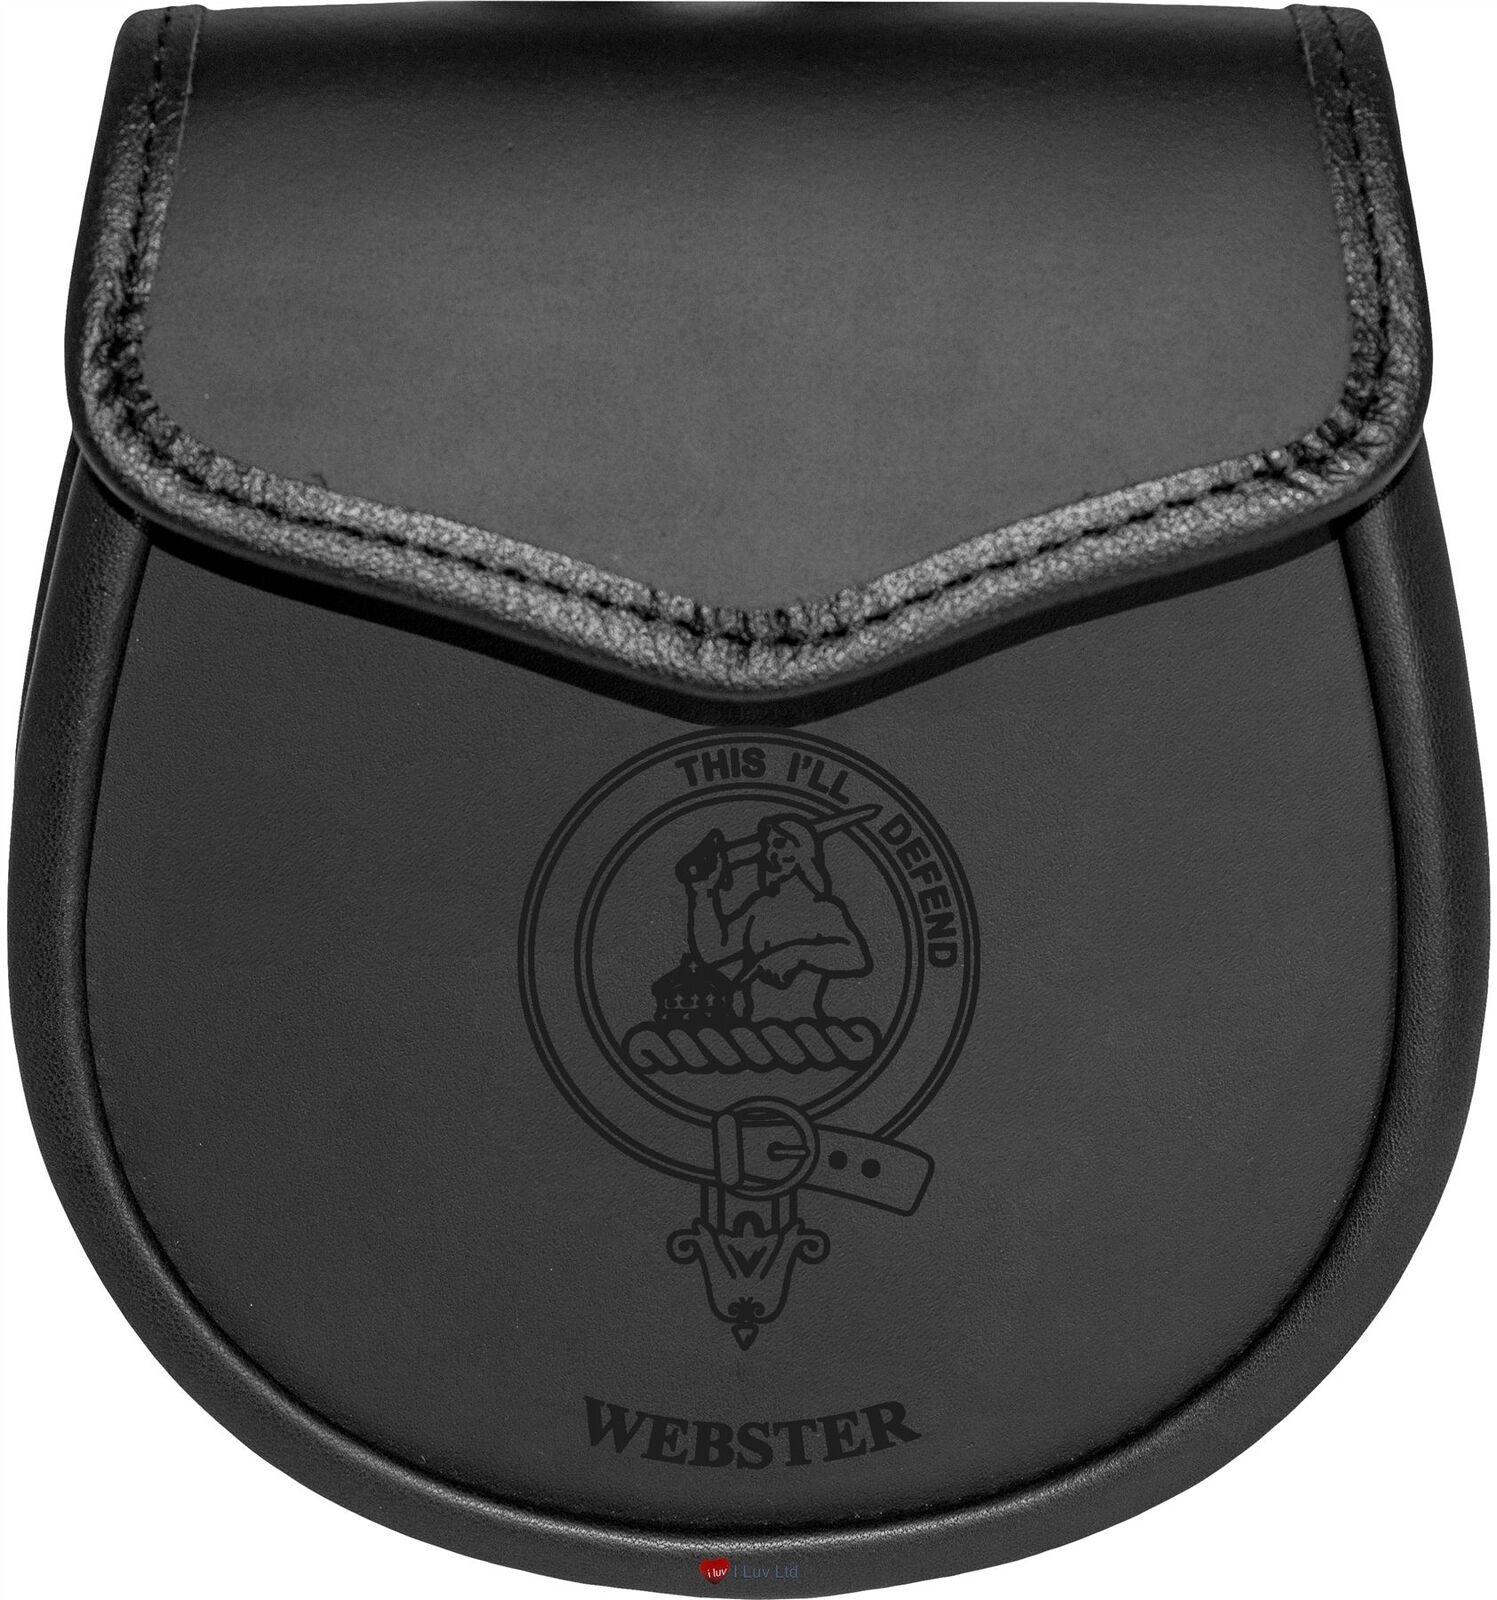 Webster Leather Day Sporran Scottish Clan Crest